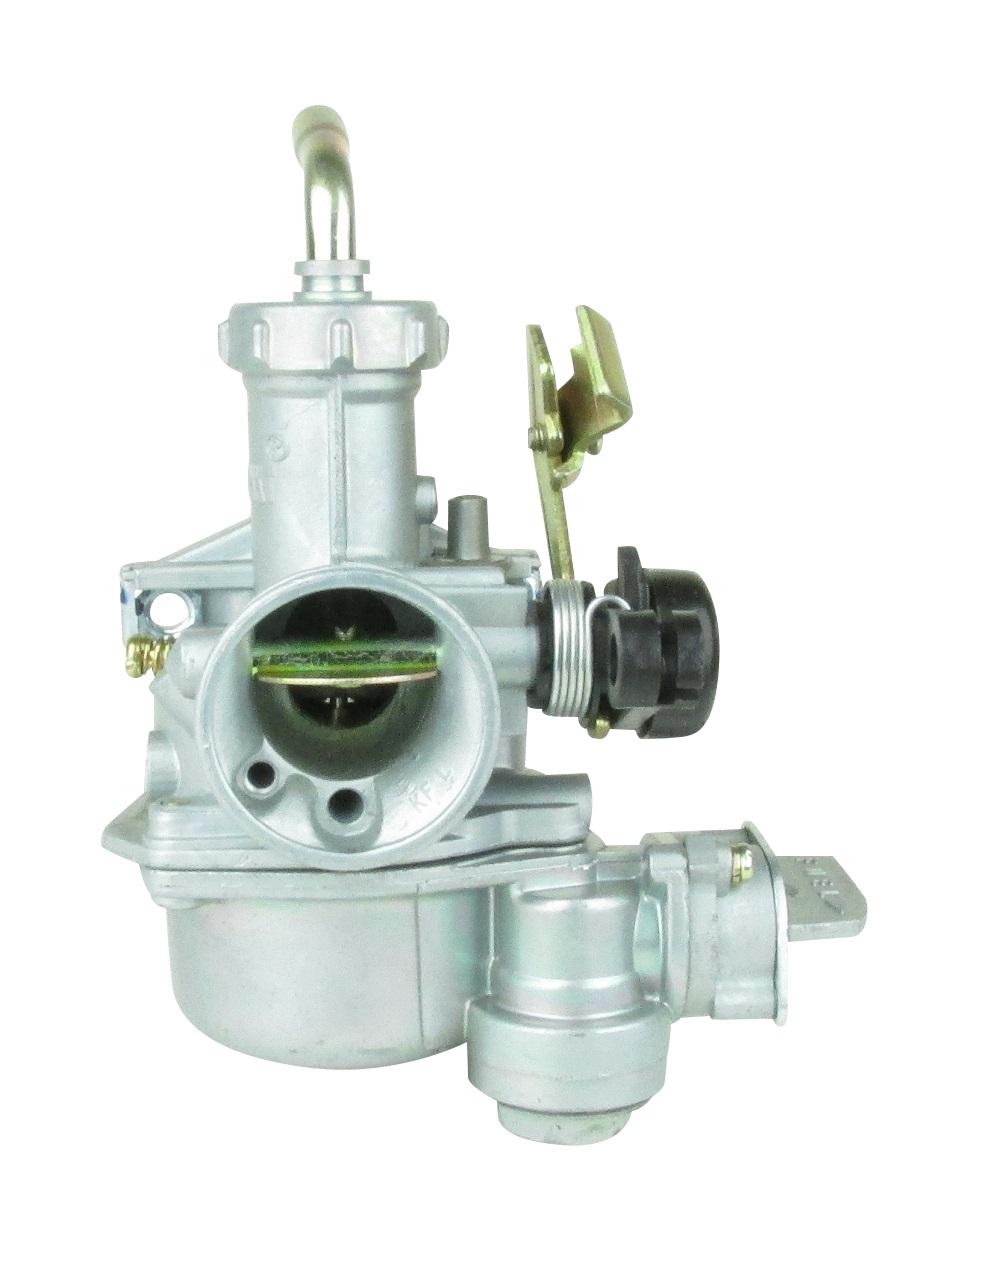 New Electric Starter Motor For 50//70//90//110//125cc TaoTao Peac JCL Roketa